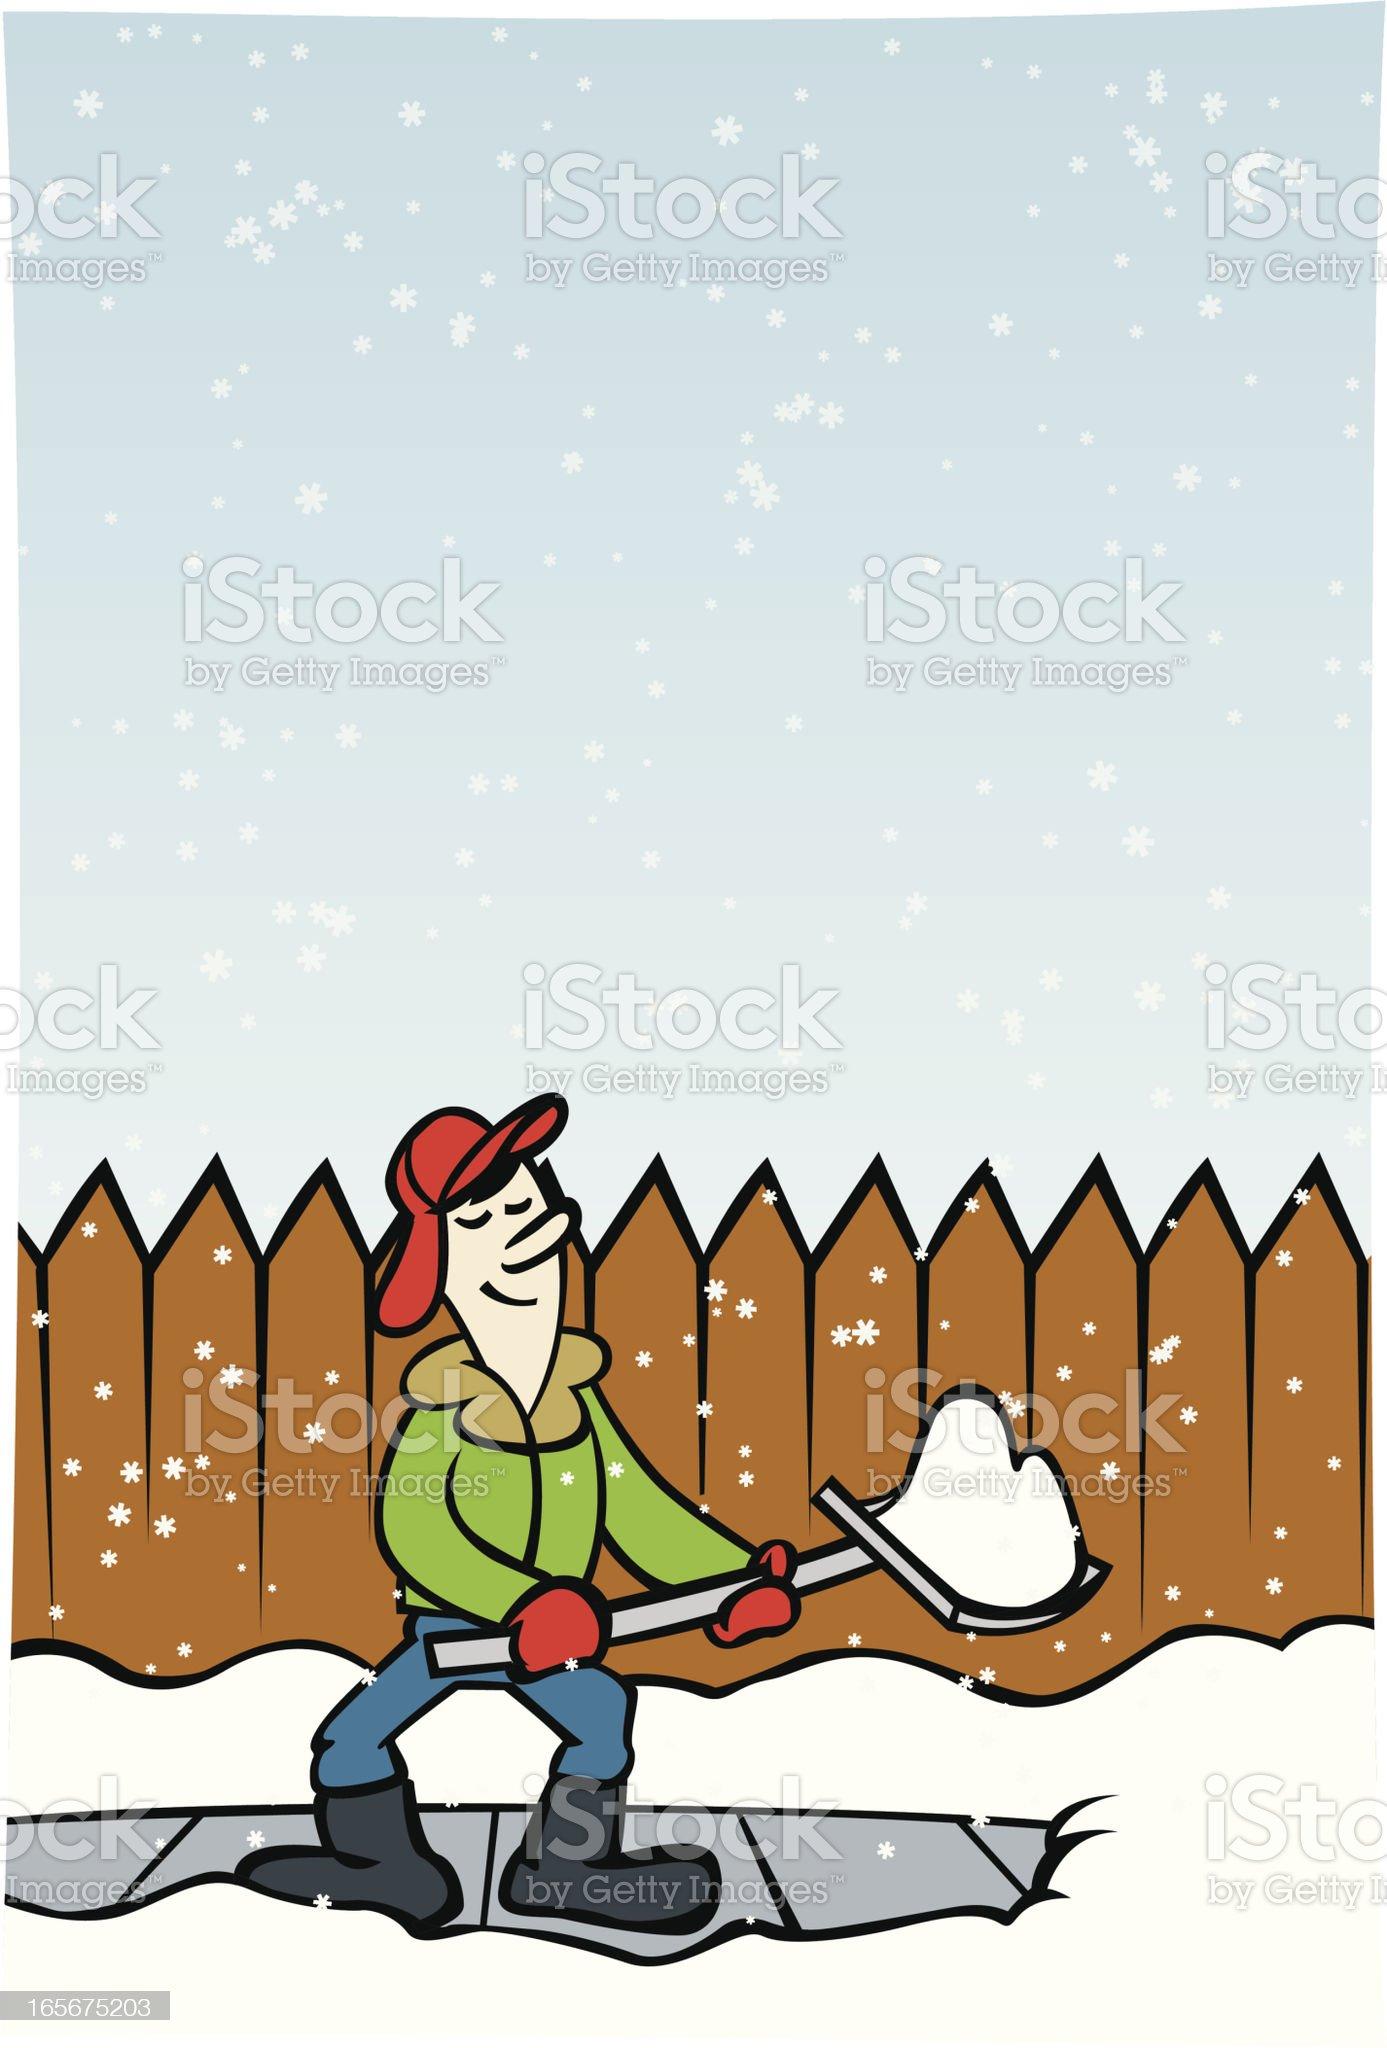 shoveling snow royalty-free stock vector art